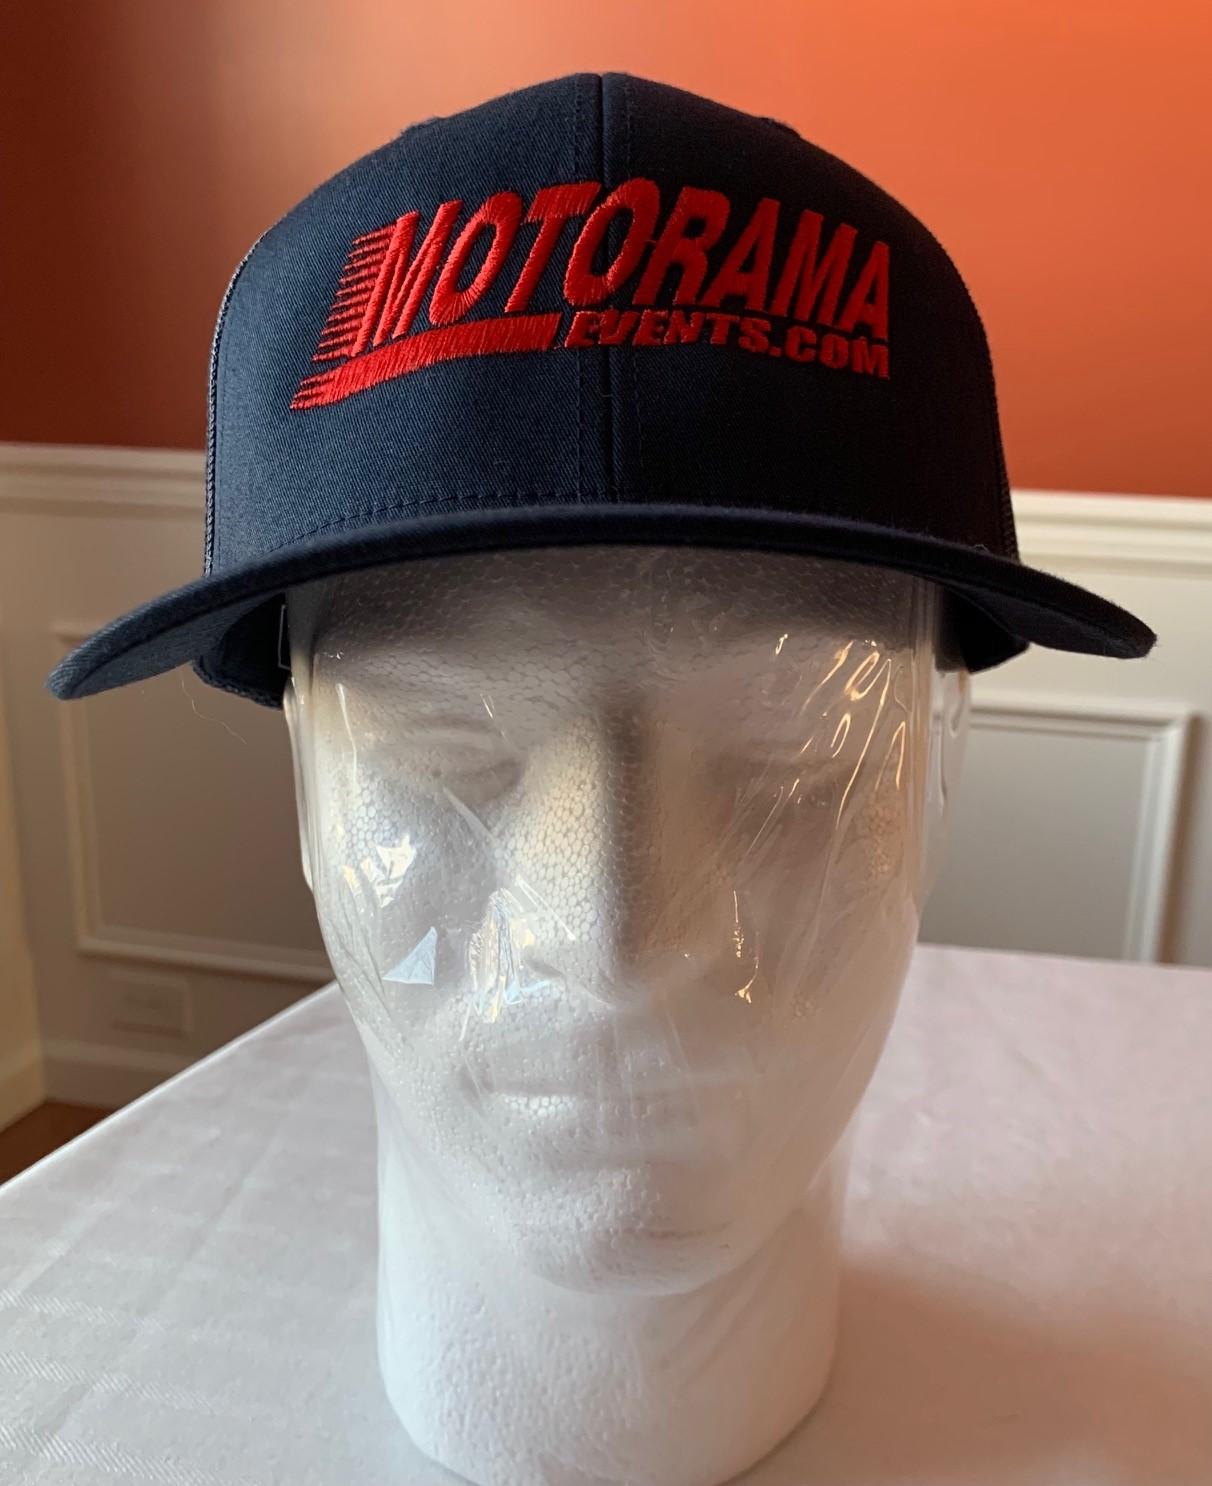 Blue Adjustable Motorama Cap